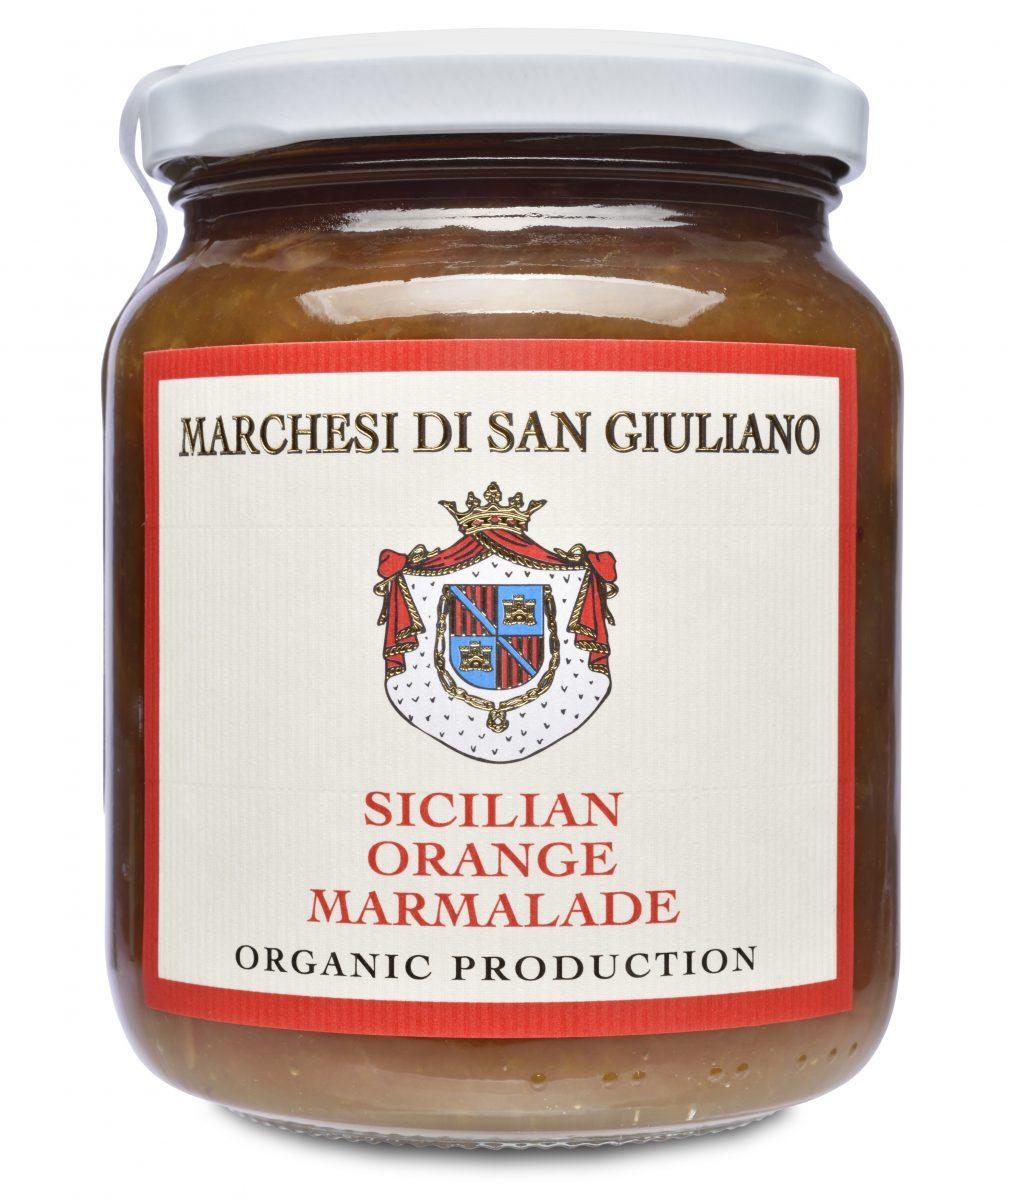 Marchesi di San Giuliano Organic Sicilian Orange Marmalade